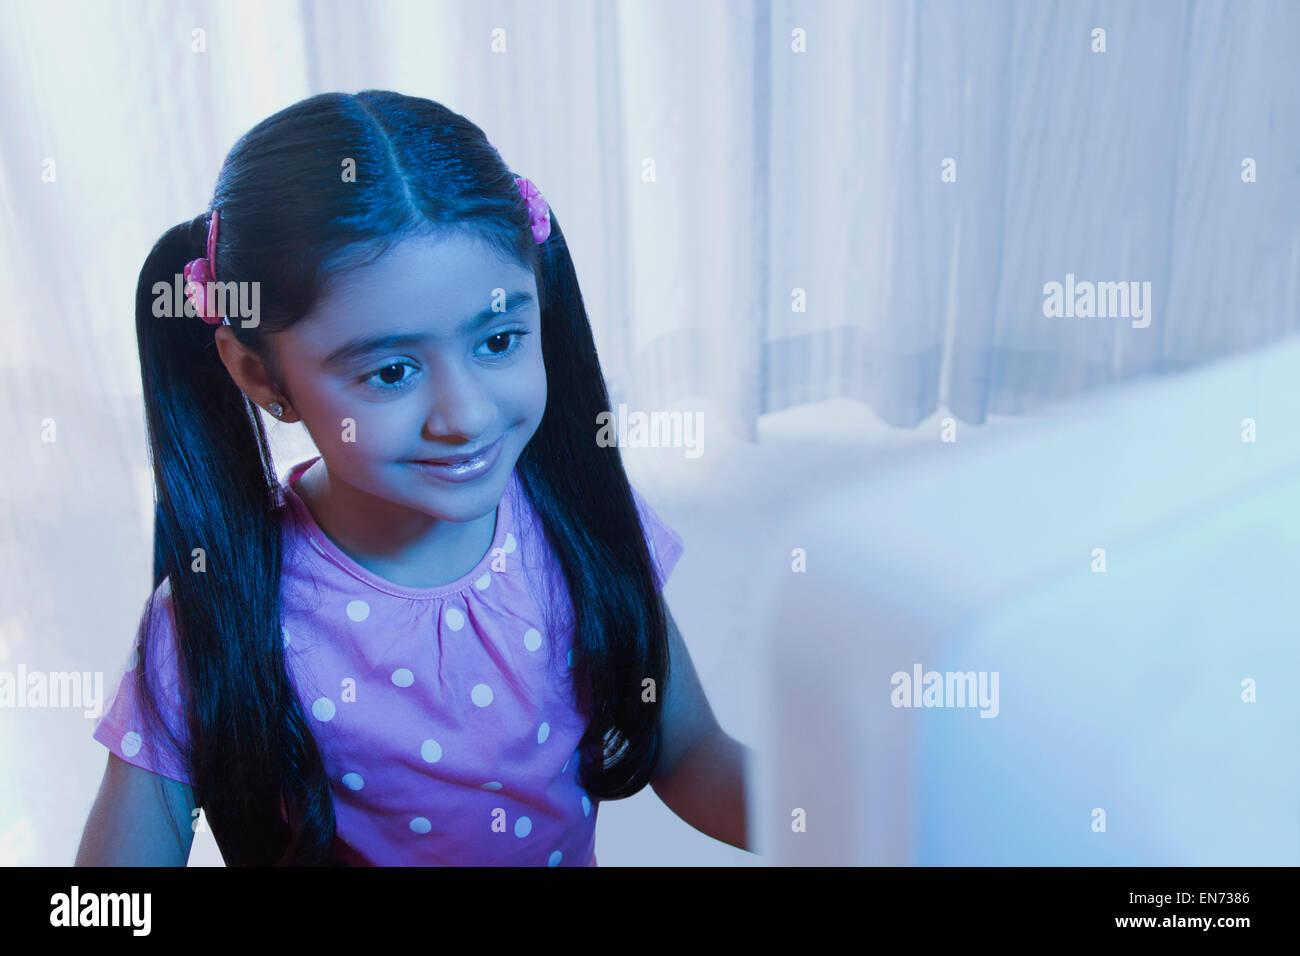 Young girl looking at a computer monitor - Stock Image